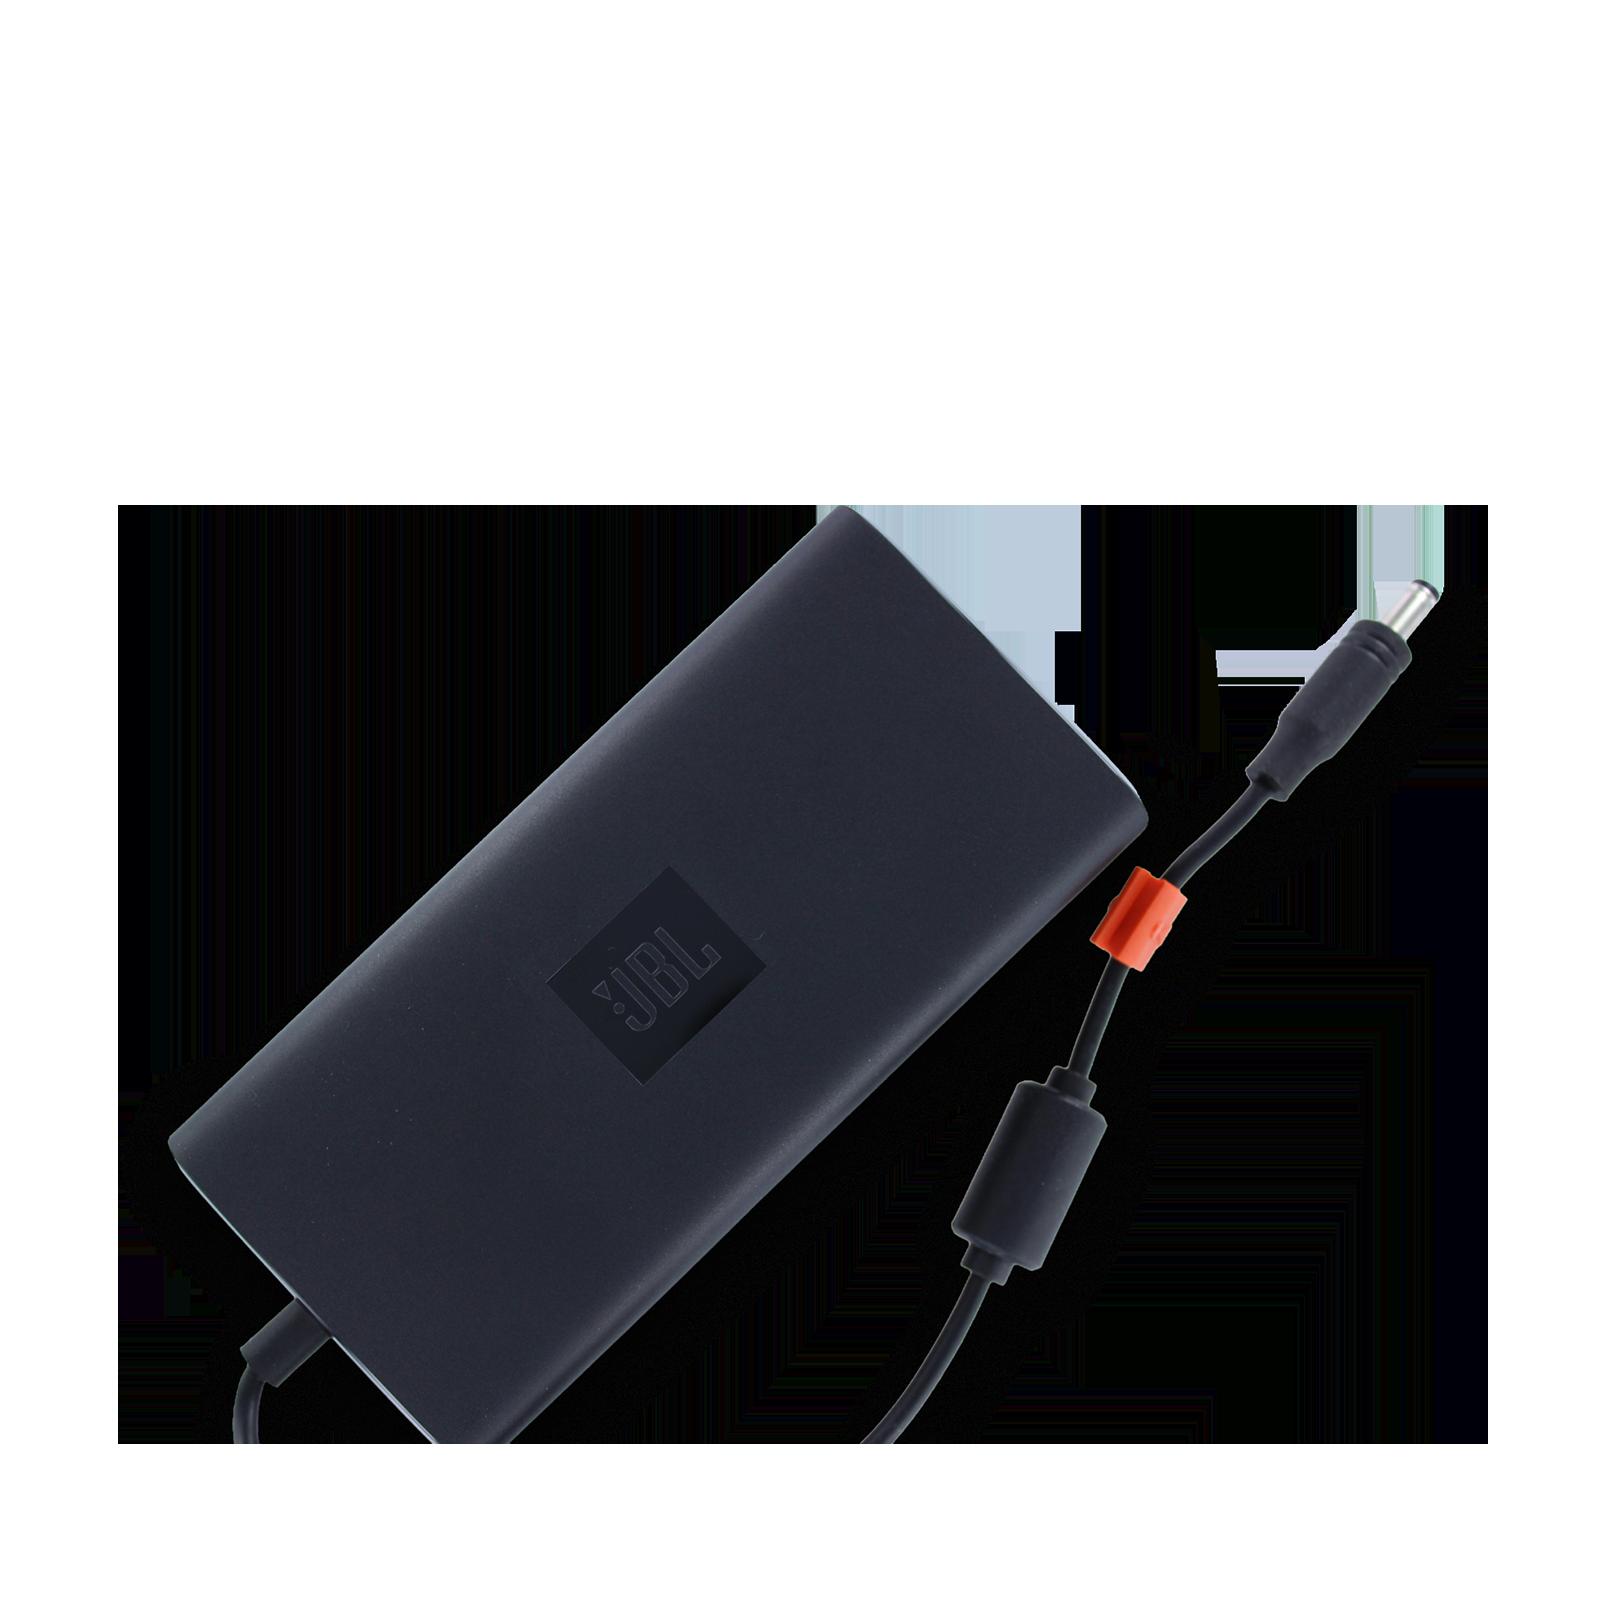 JBL Power adapter for Boombox - Black - Power adaptor - Hero